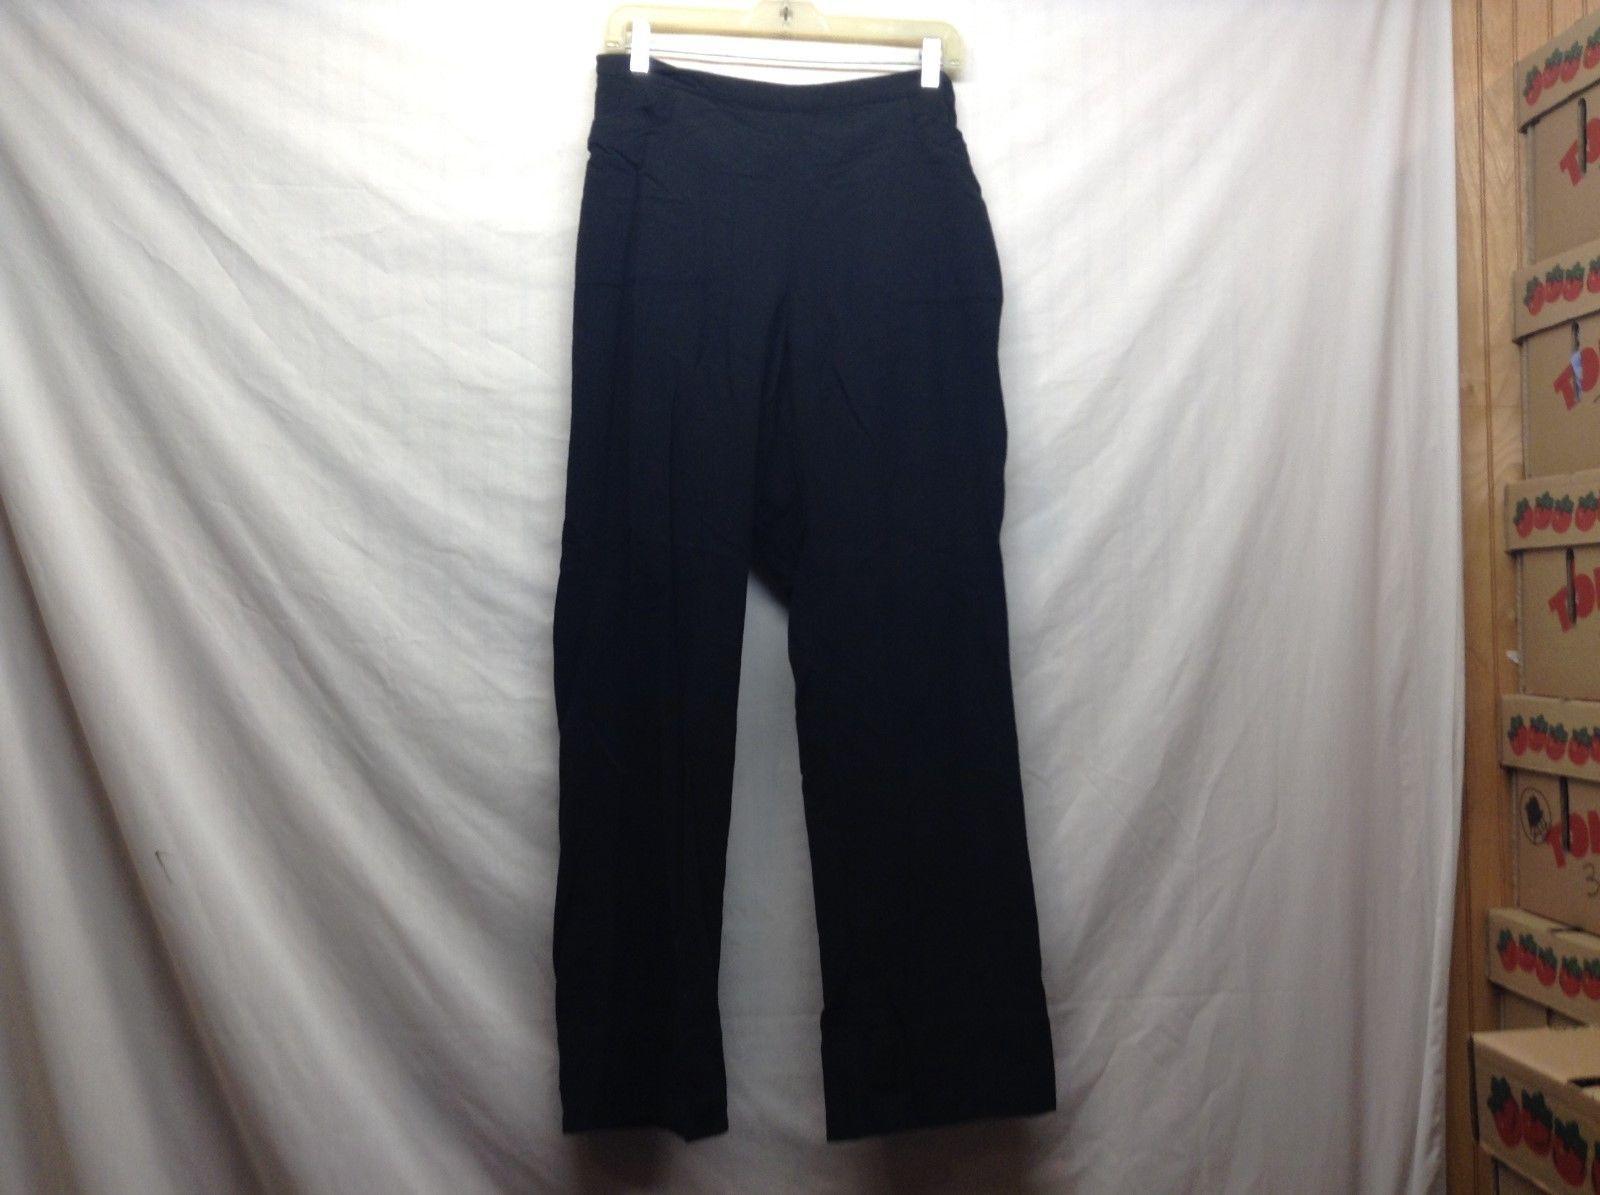 Soft Surroundings Ladies Black Stretchy Pants Size Medium